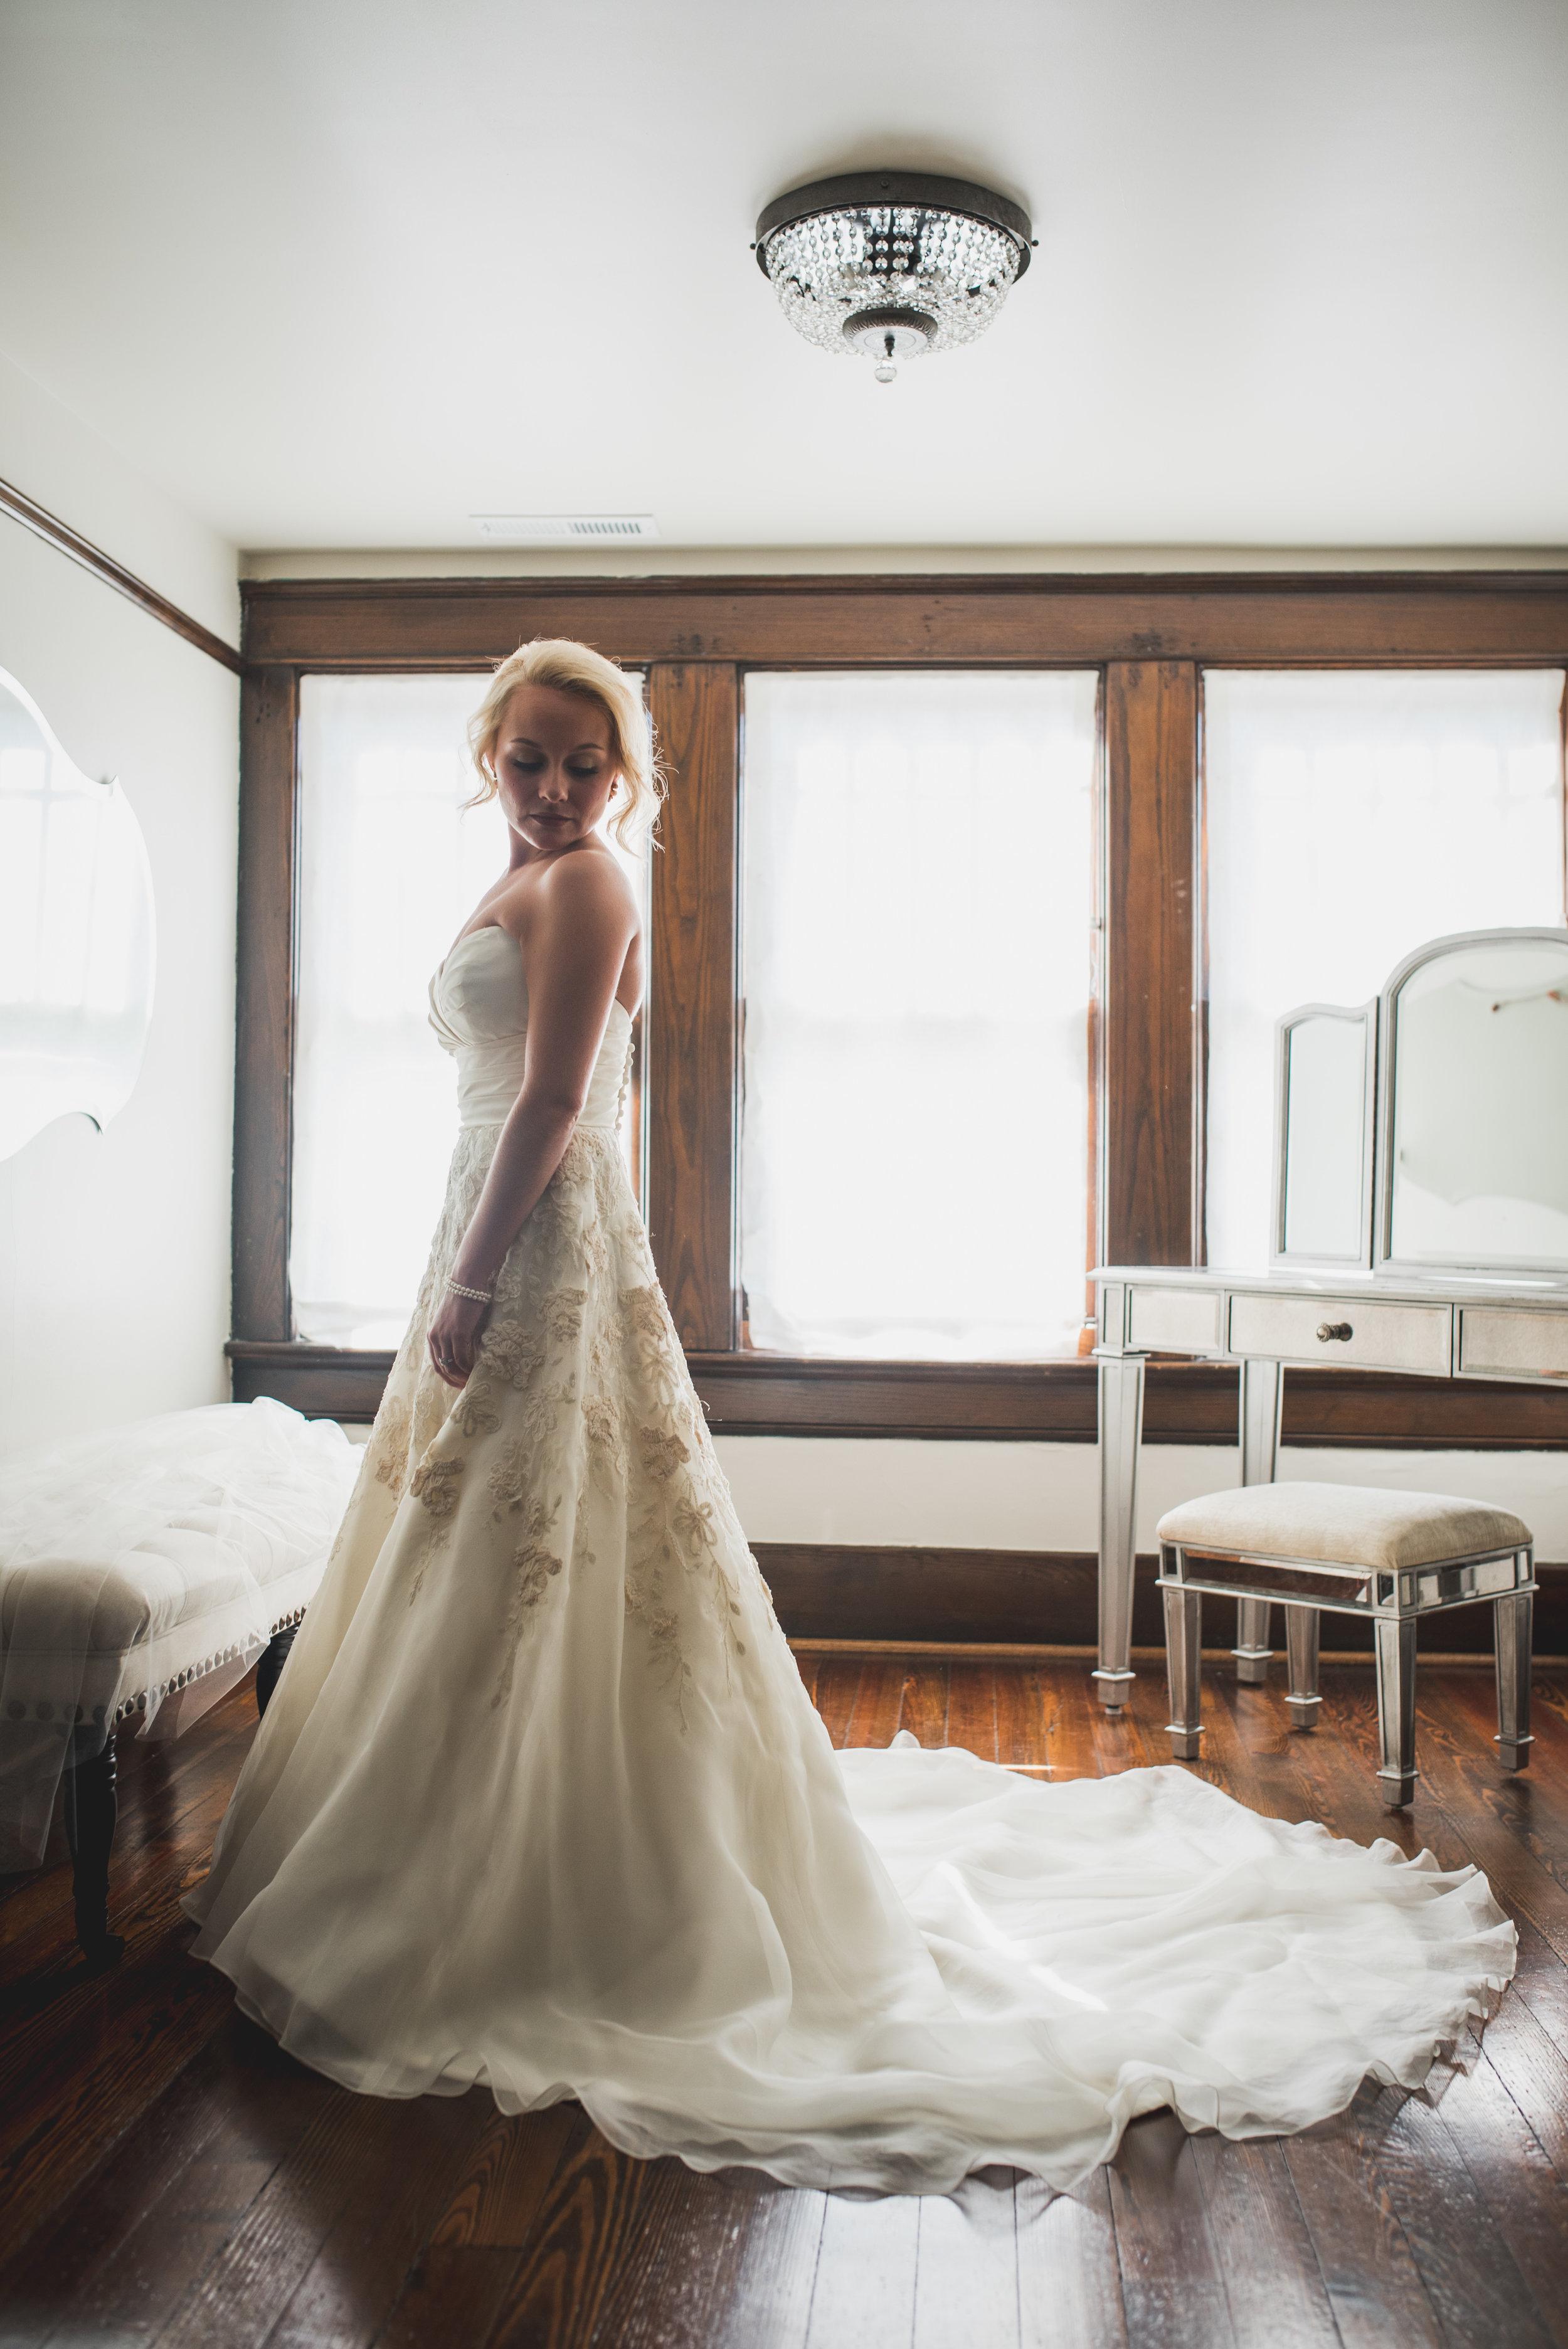 Nashville-wedding-photographers-CJ's-Off-The-Square-6.JPG